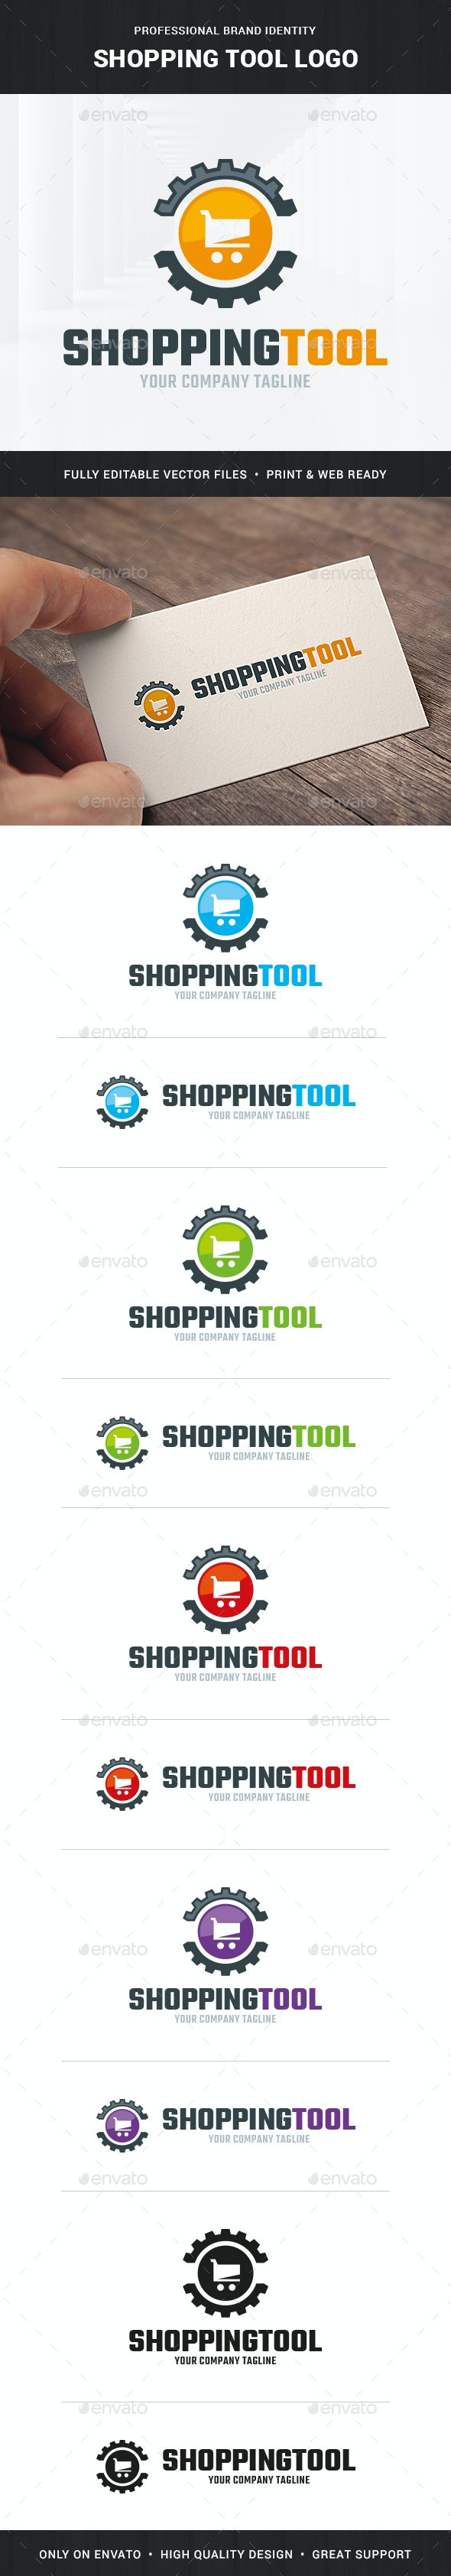 Shopping Tool Logo Template - Symbols Logo Templates